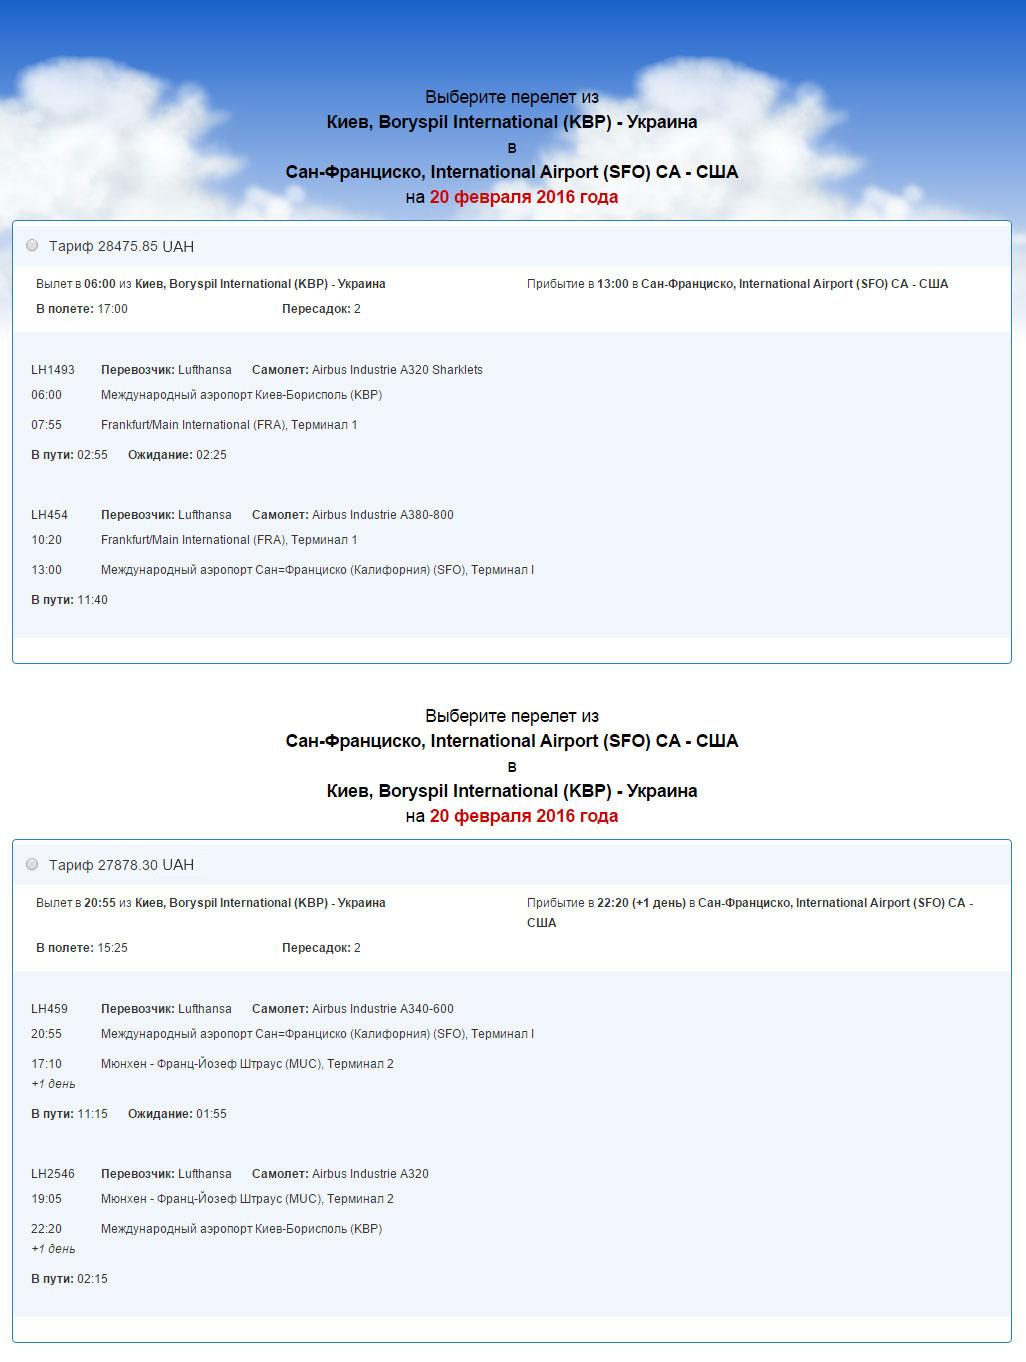 Lufthansa.com: Решение для сервиса по продаже авиабилетов / Автоматизация, разработка сервиса, ZennoPoster